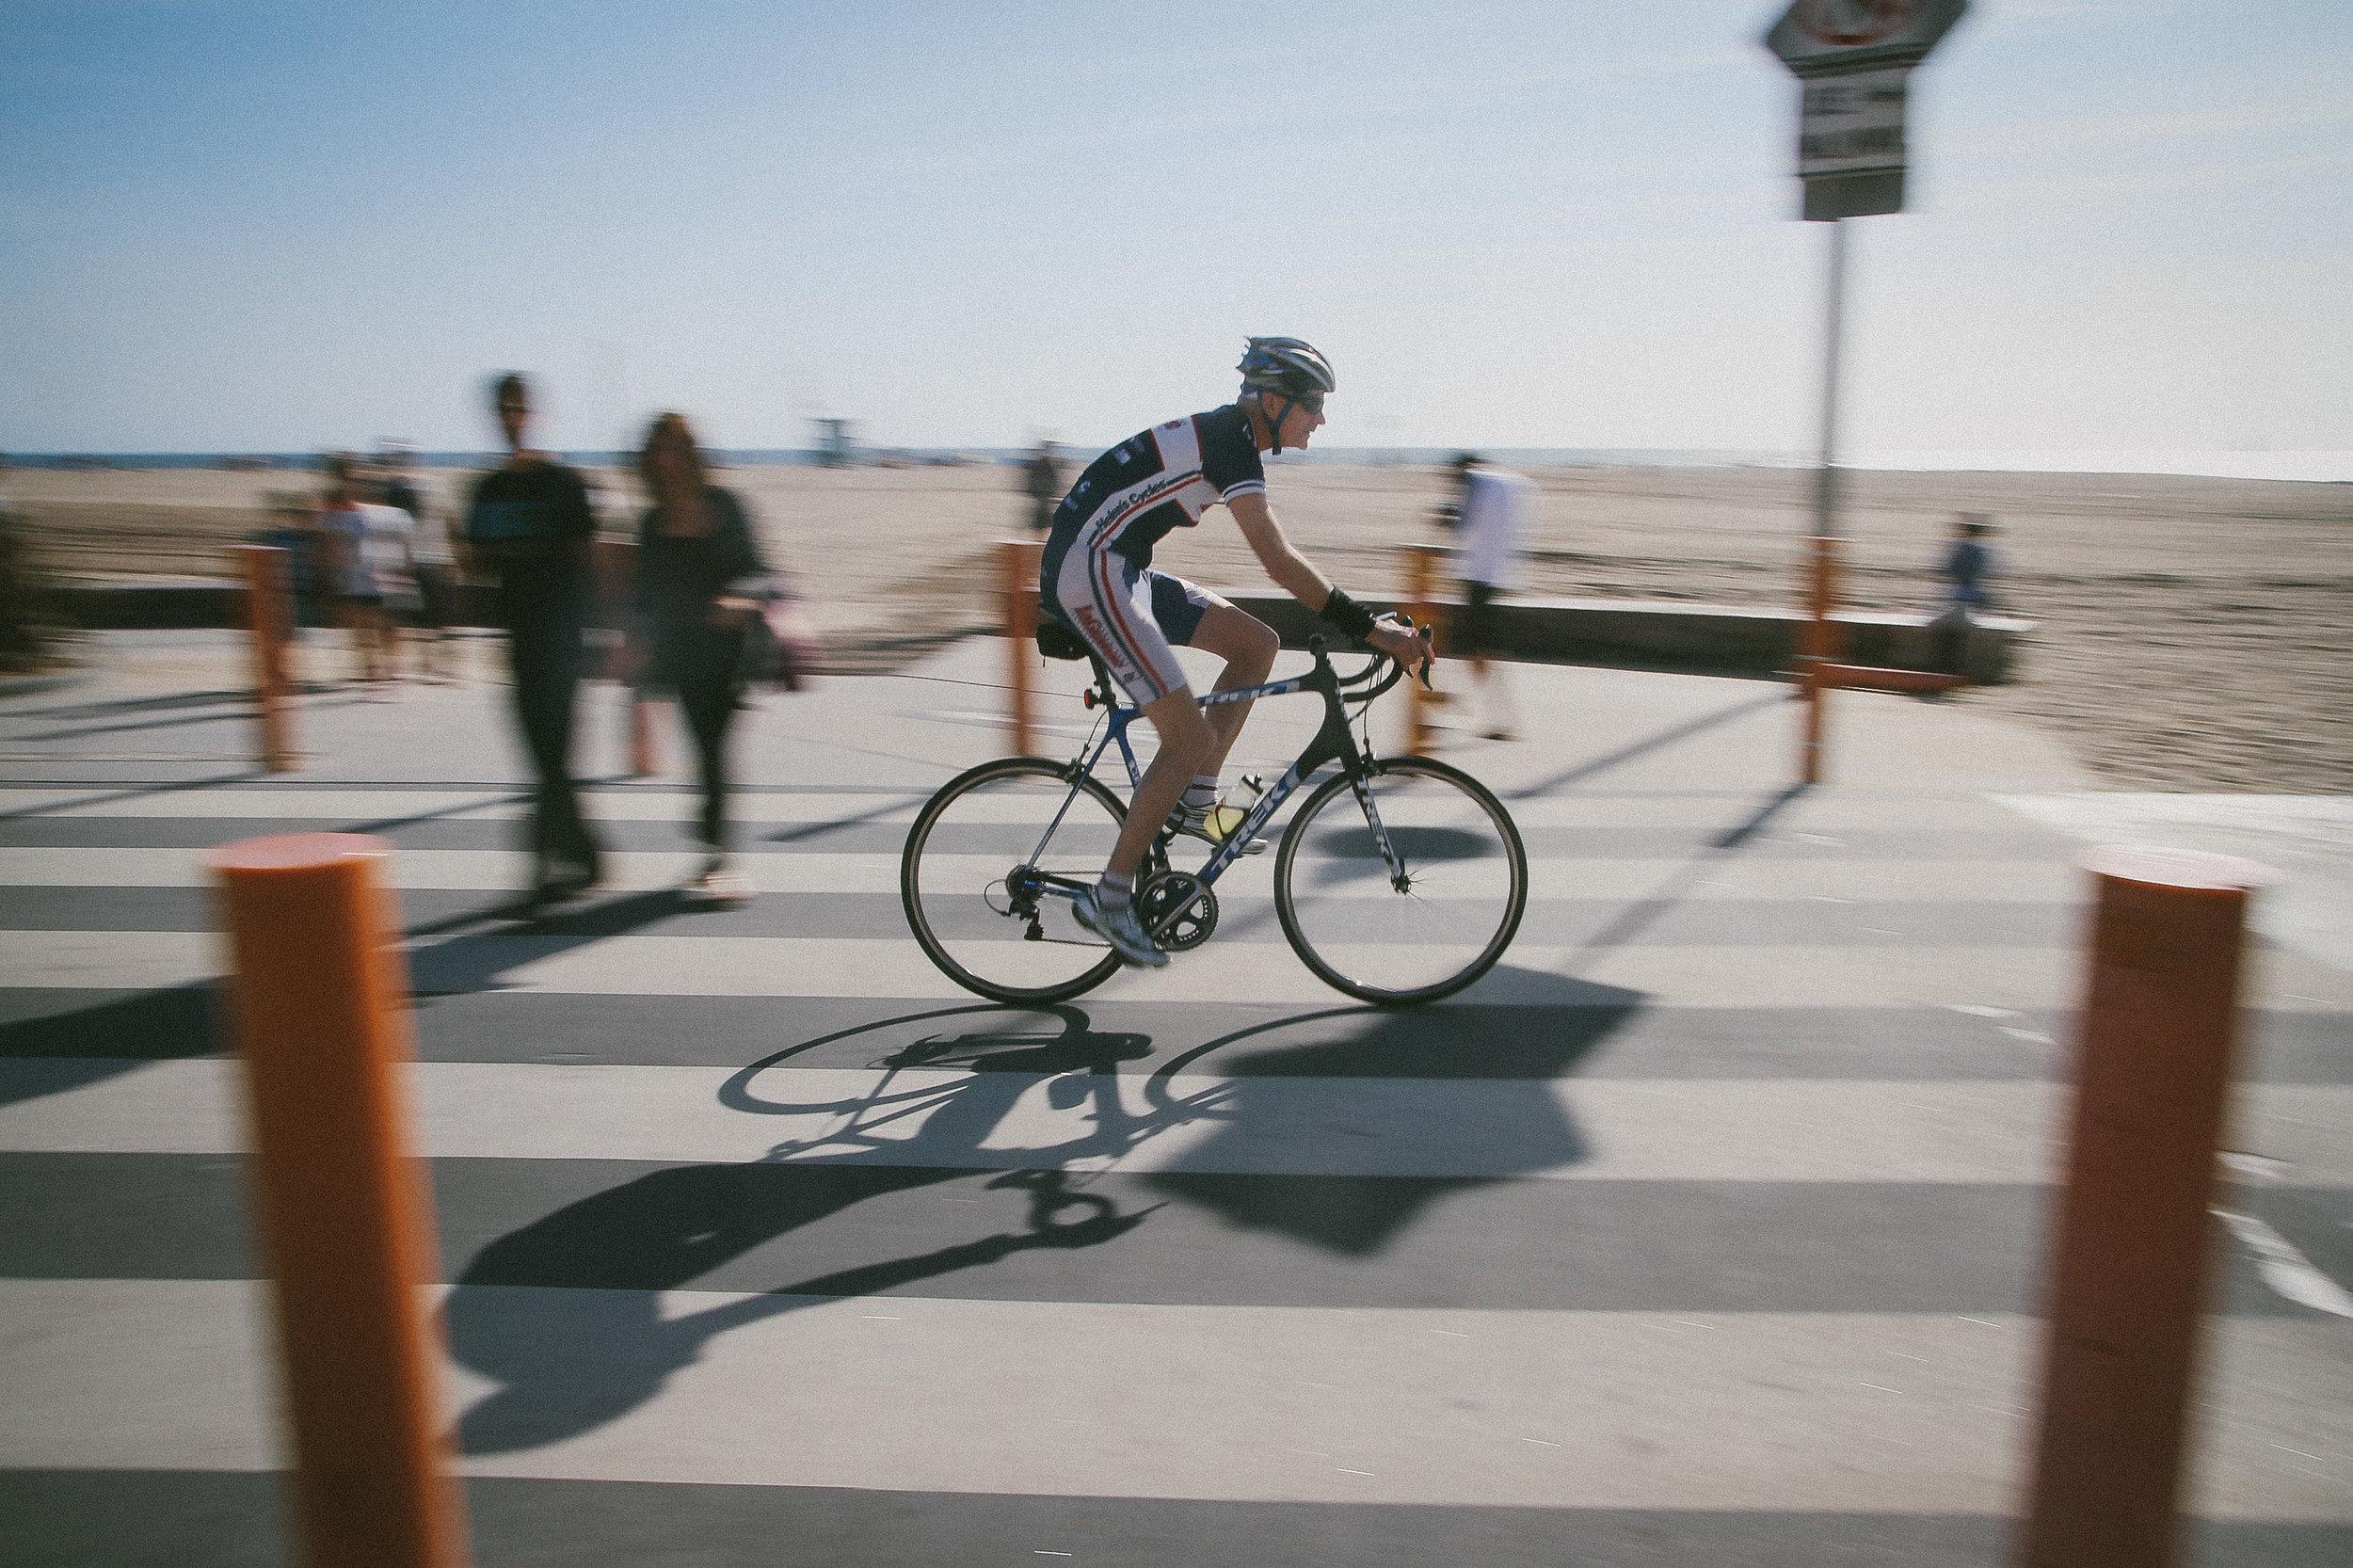 2015-04 Santa Monica cyclist.jpg